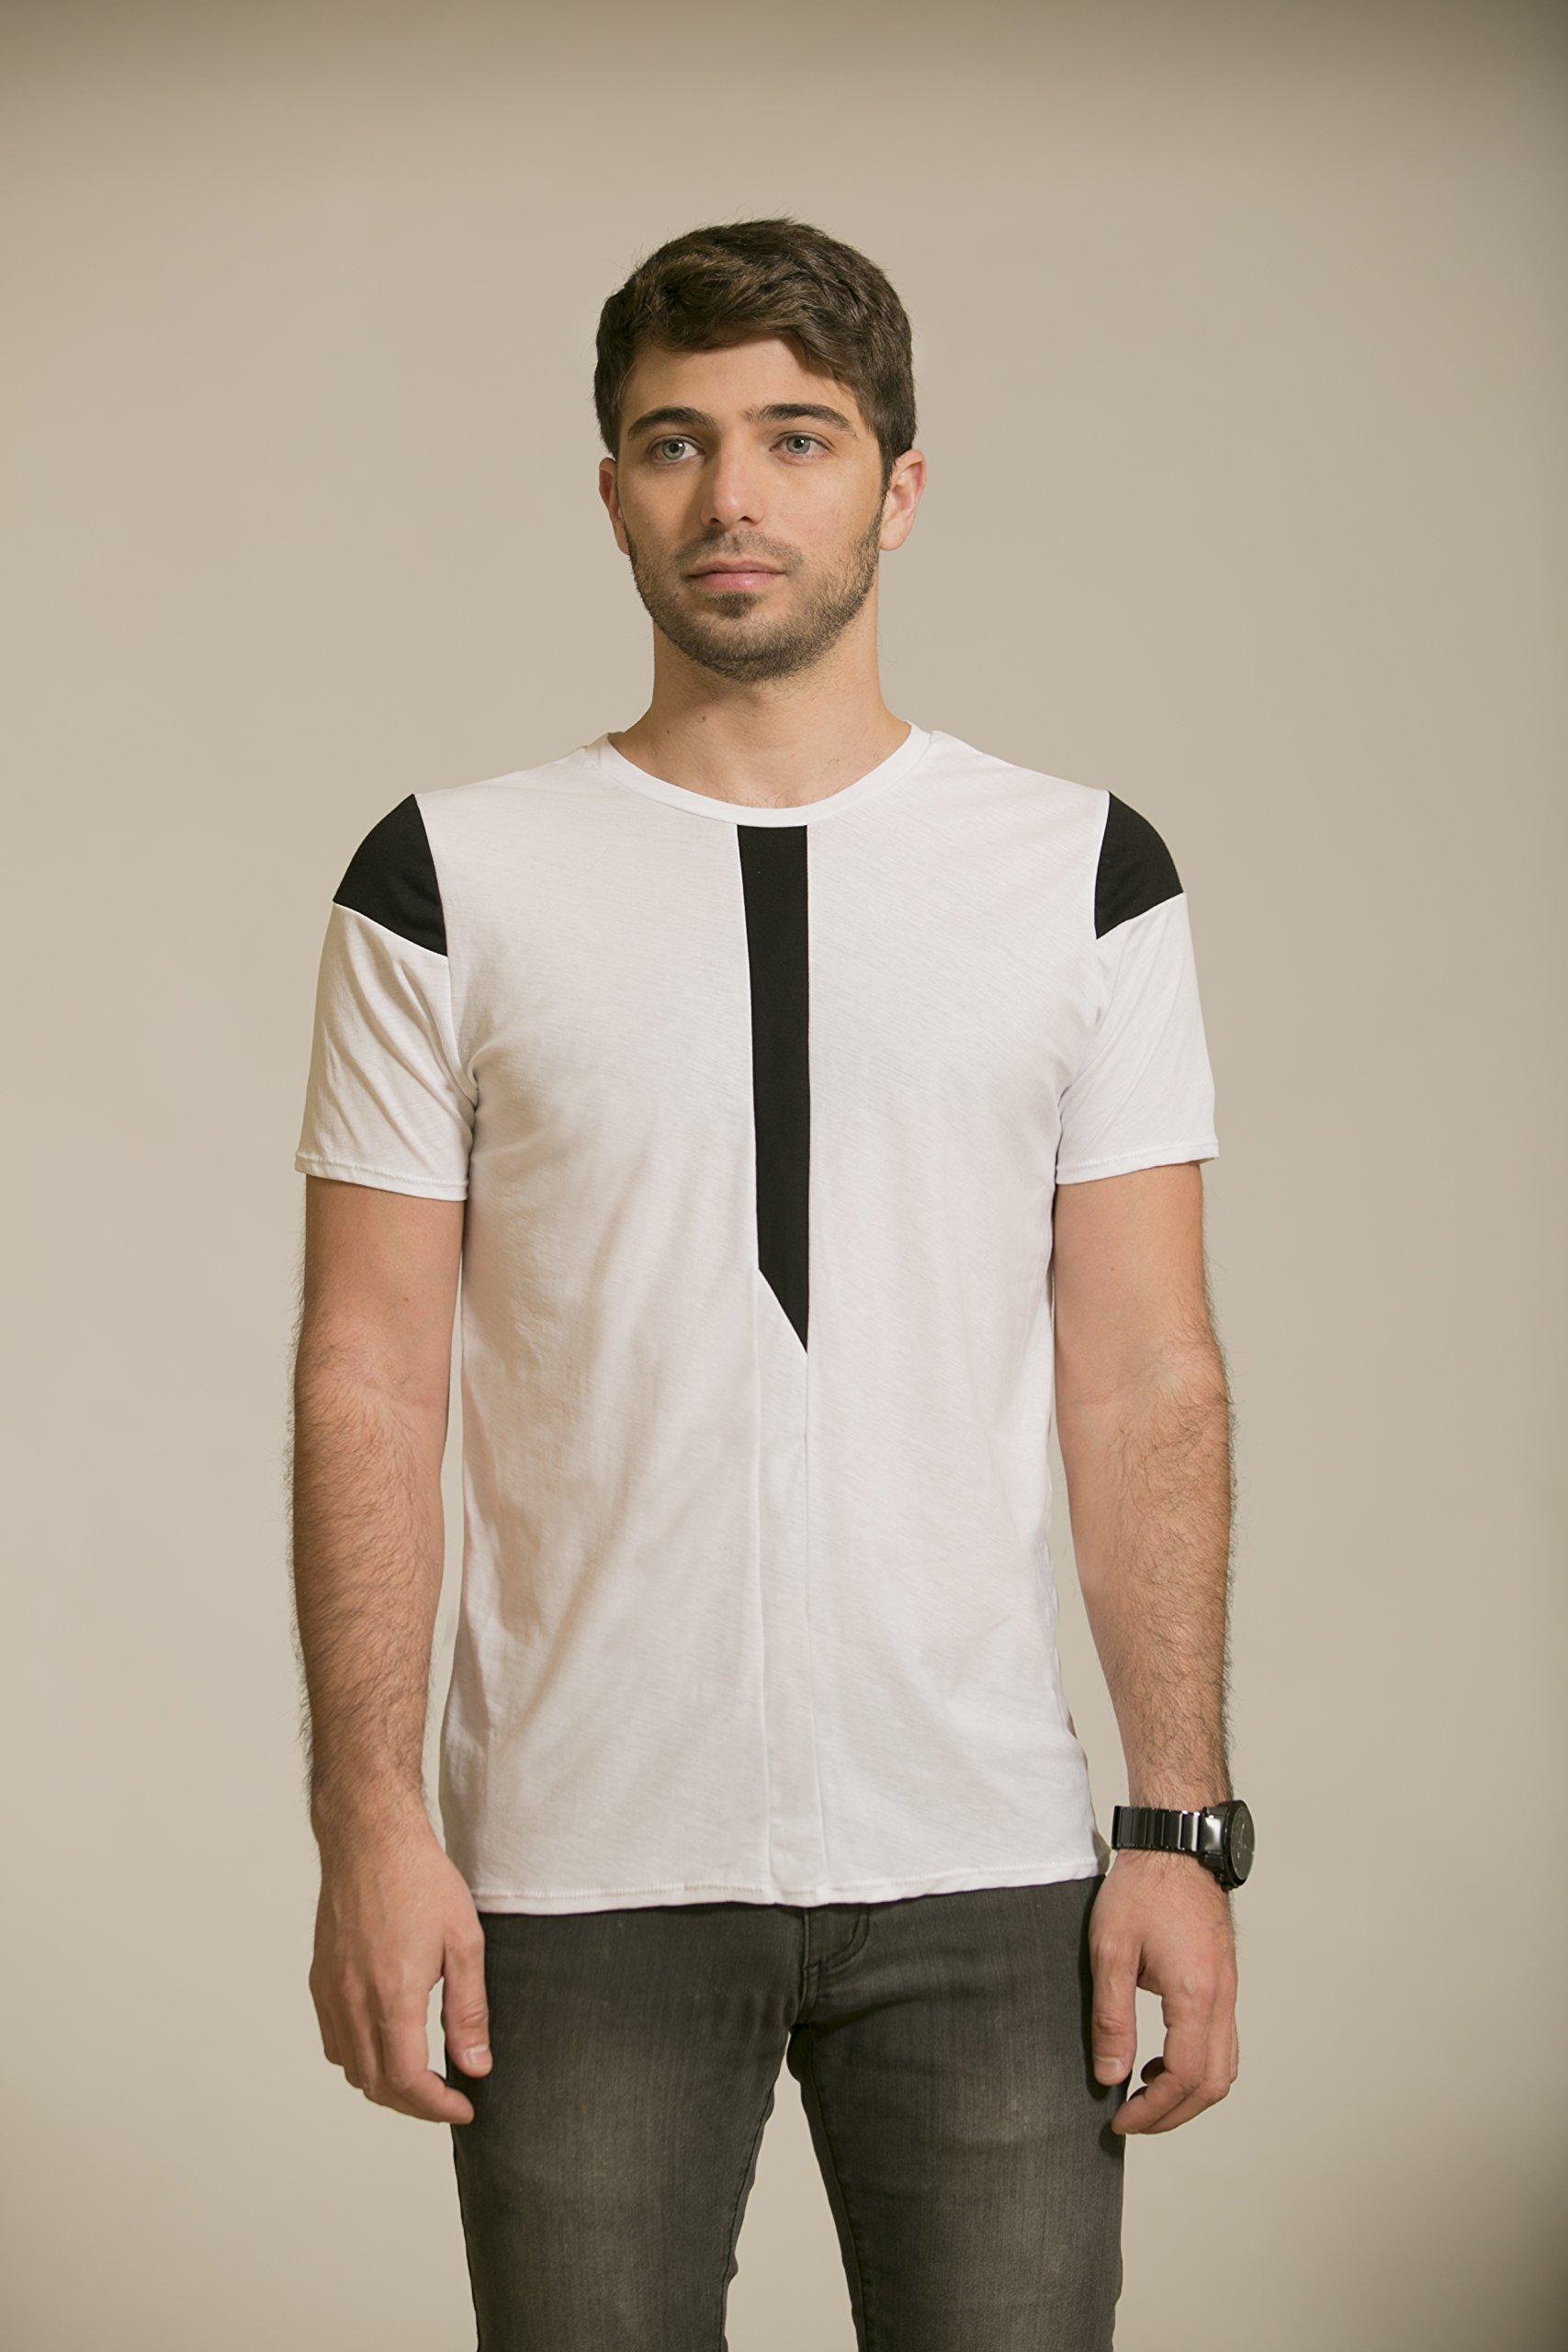 Mens shirt, Mens white shirt, short sleeve shirt, cotton shirt, Mens tshirt white, tshirt cotton, shirt minimalist, clothing fashion